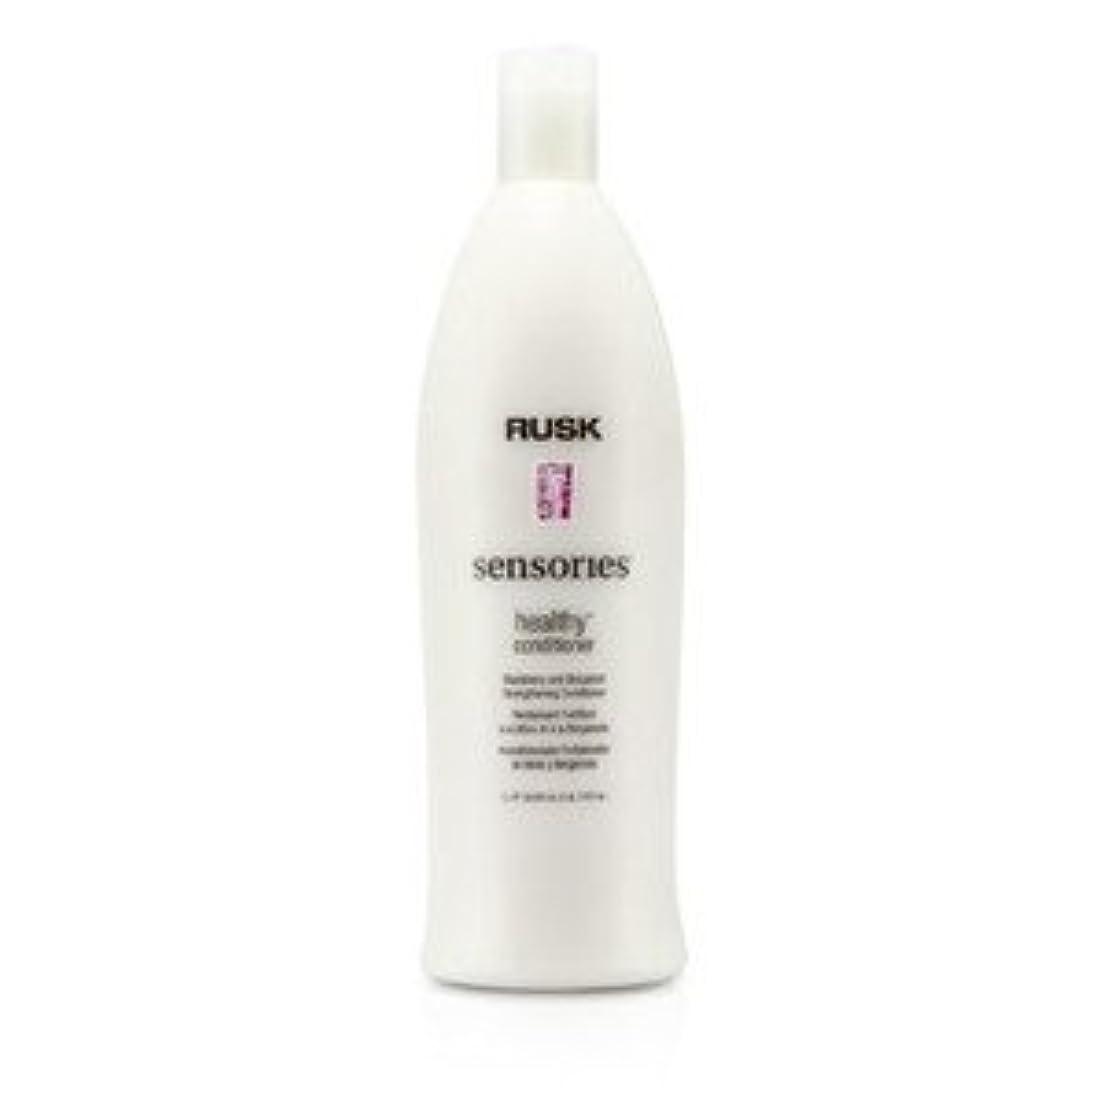 RUSK(ラスク) センソリーズ ヘルシー ブラックベリー&ベルガモット(髪を強化する)コンディショナー 1000ml/33.8oz [並行輸入品]